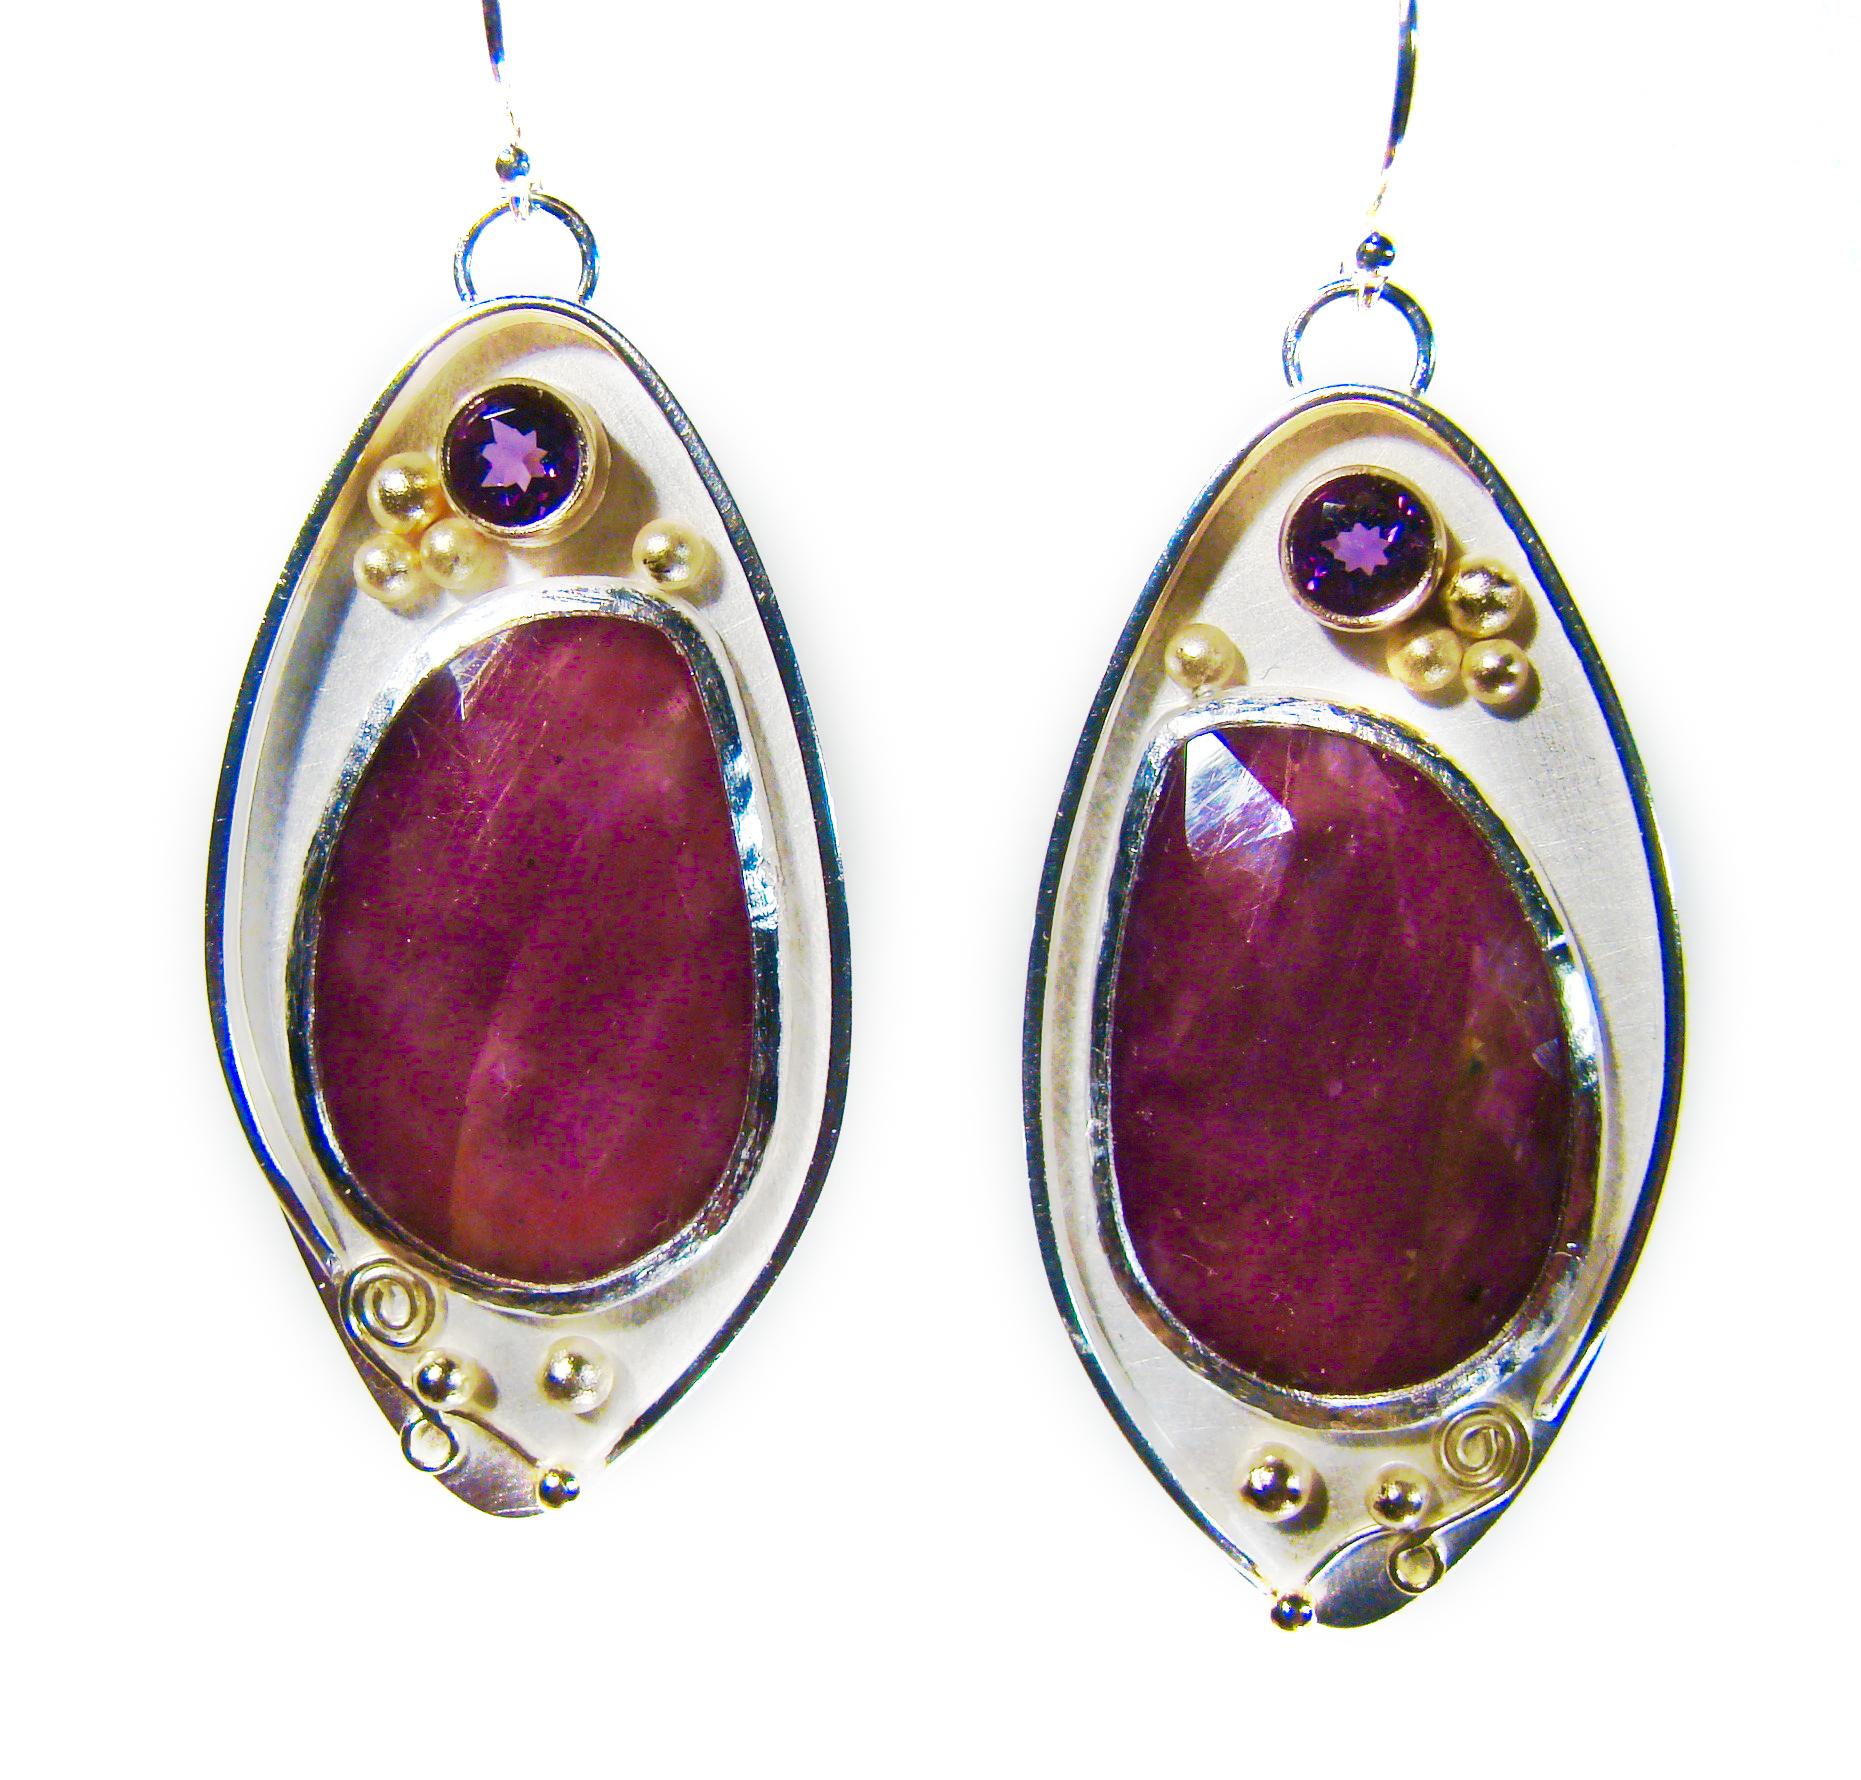 Rose+cut+sapphire+earrings.jpg